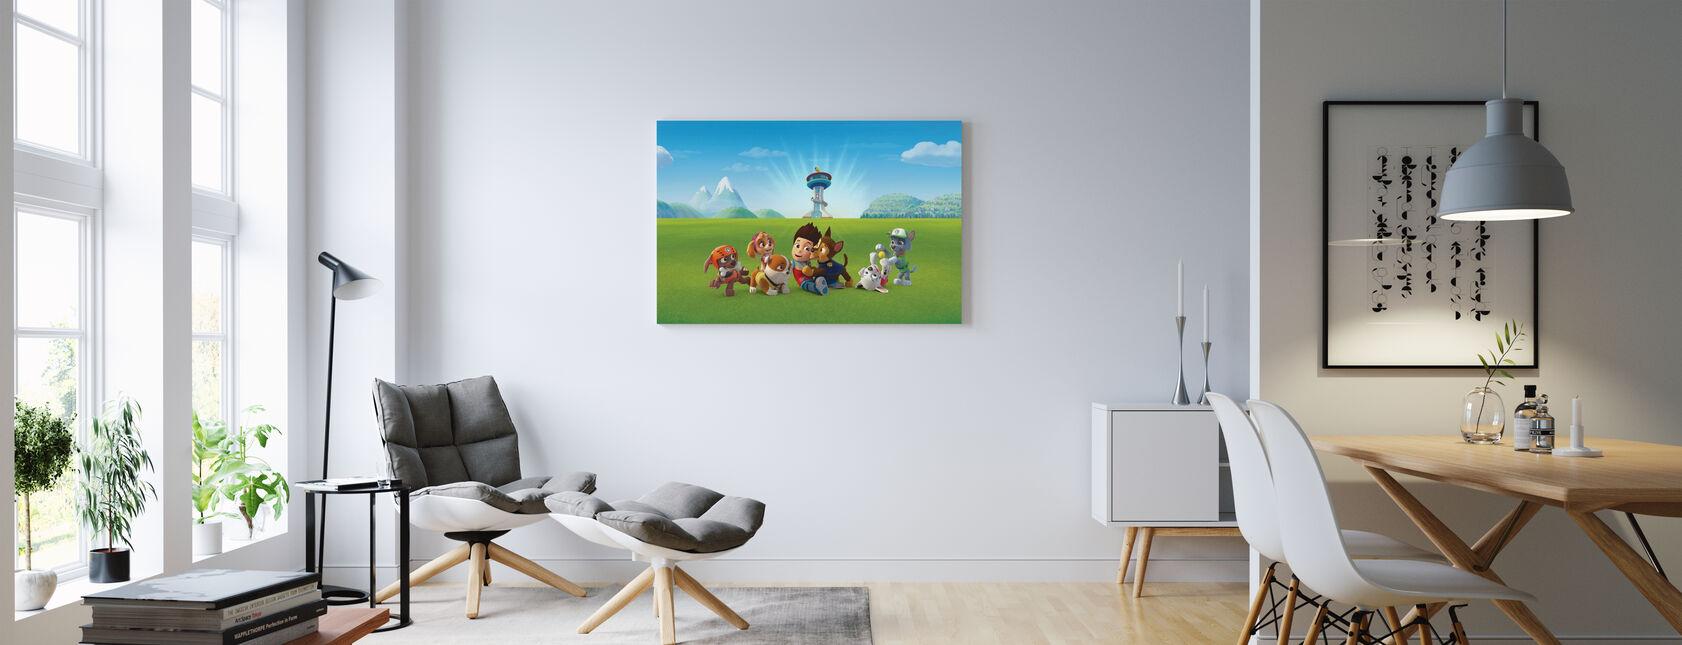 PAW Patrol - Off Duty - Canvas print - Living Room